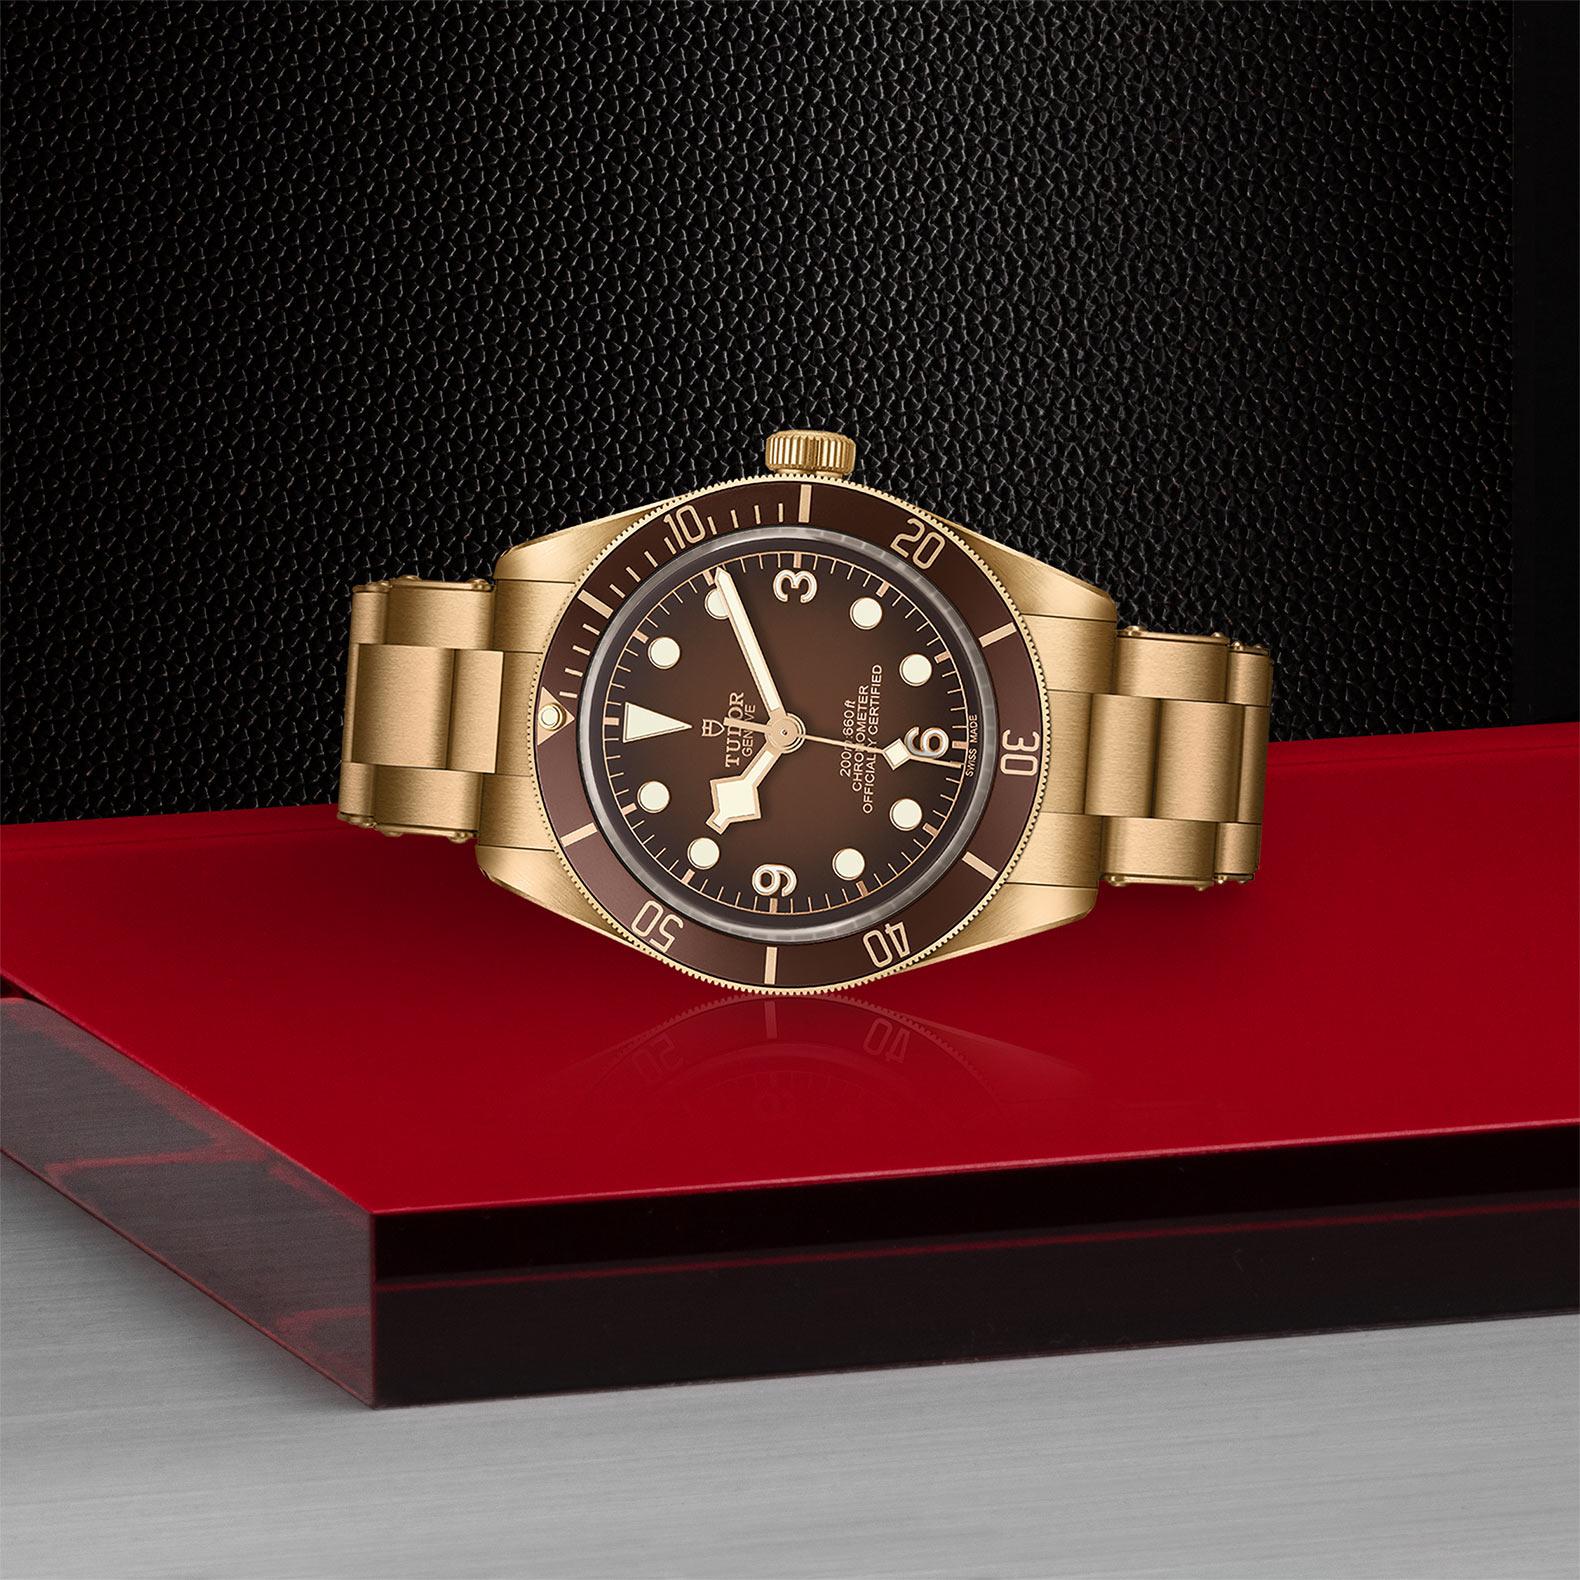 TUDOR Black Bay Fifty-Eight Bronze - M79012M-0001